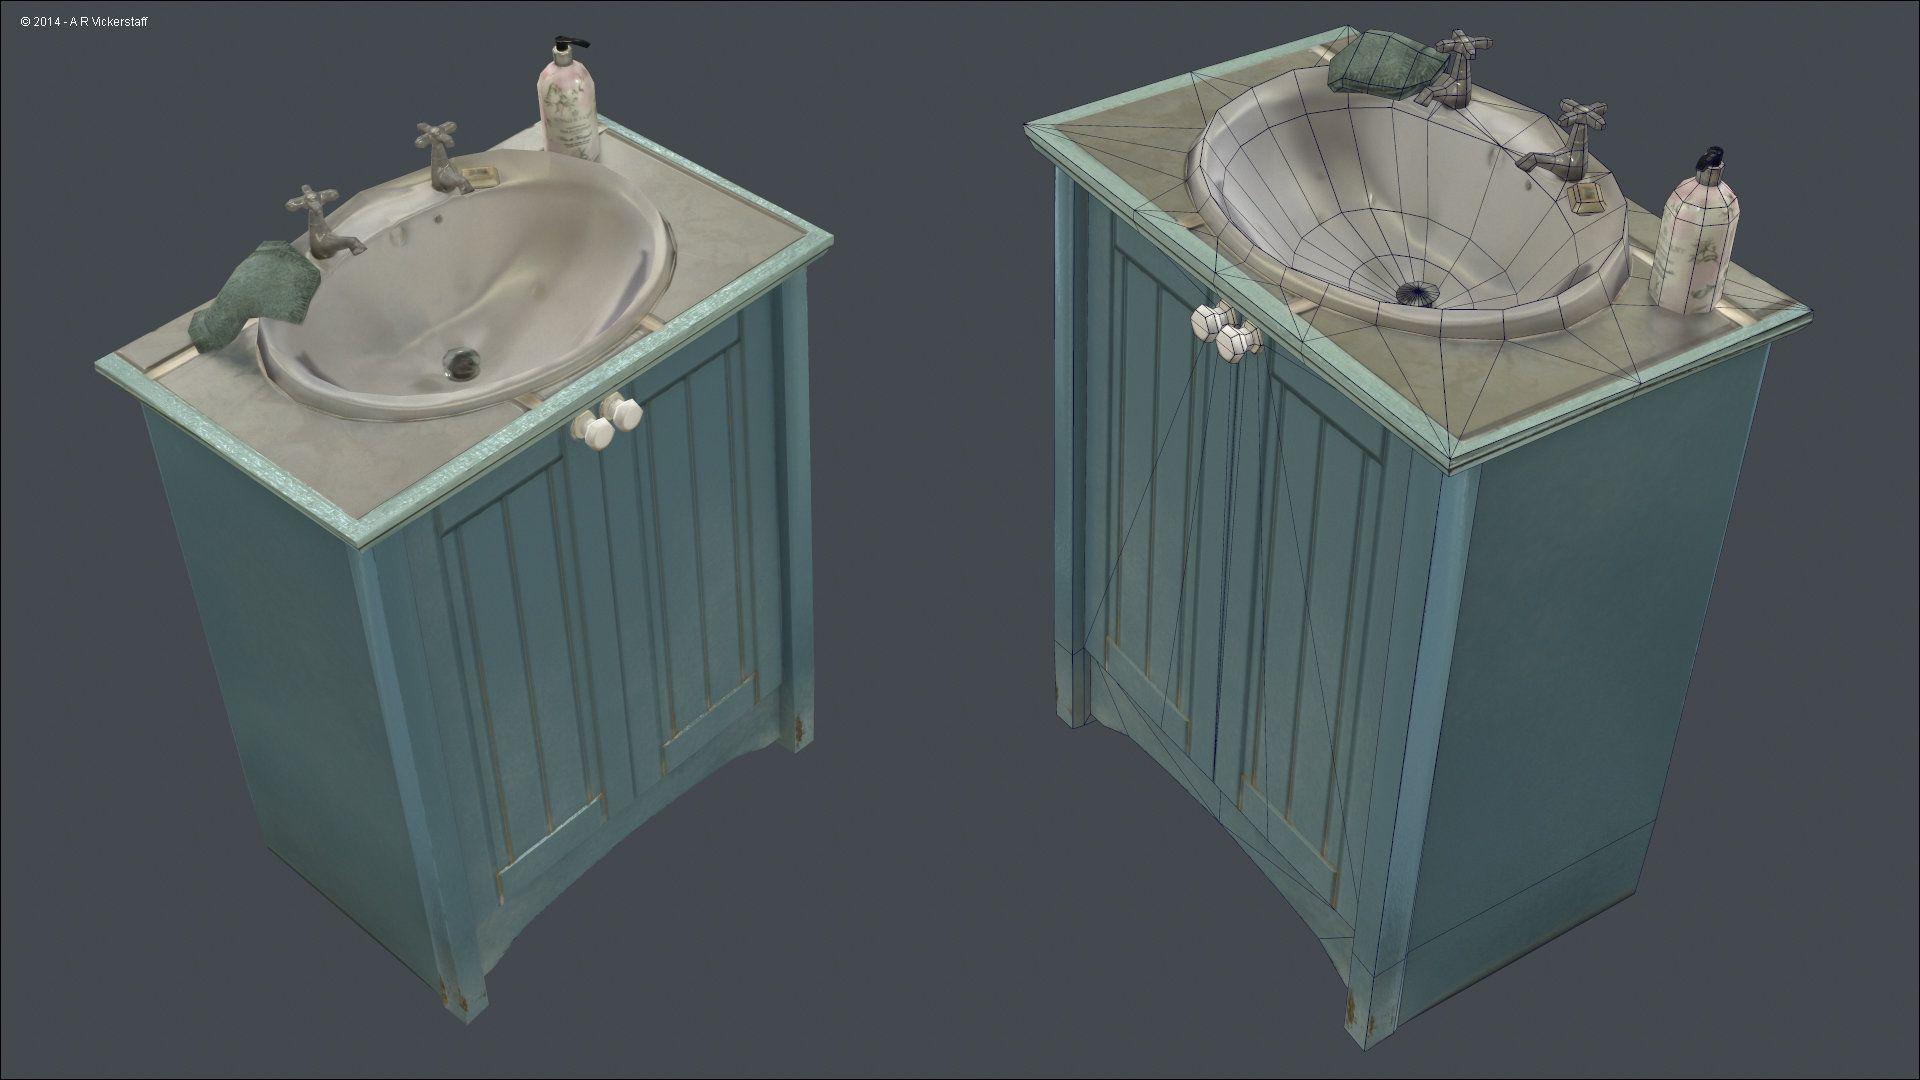 ArtStation - Sink low poly, Adam Vickerstaff